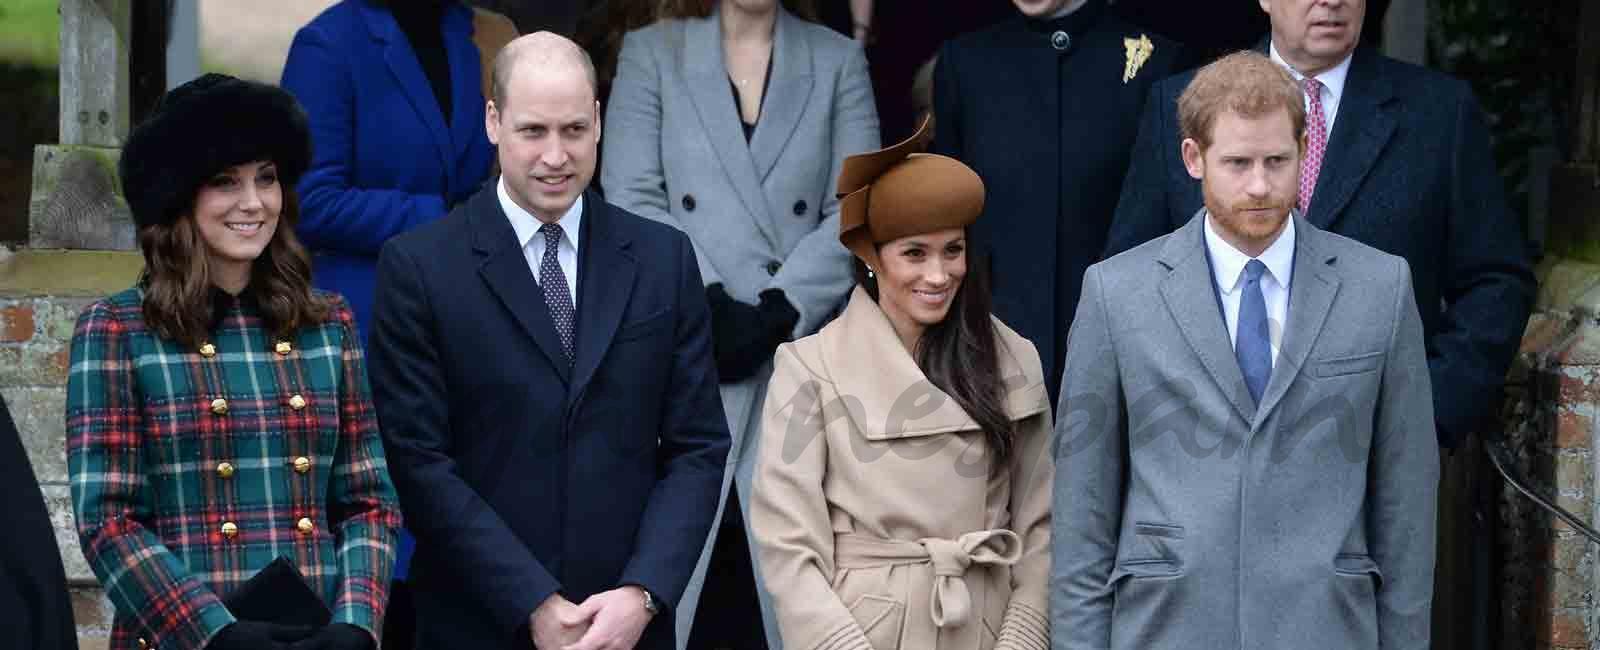 Meghan Markle y Kate Middleton: primer duelo de estilo